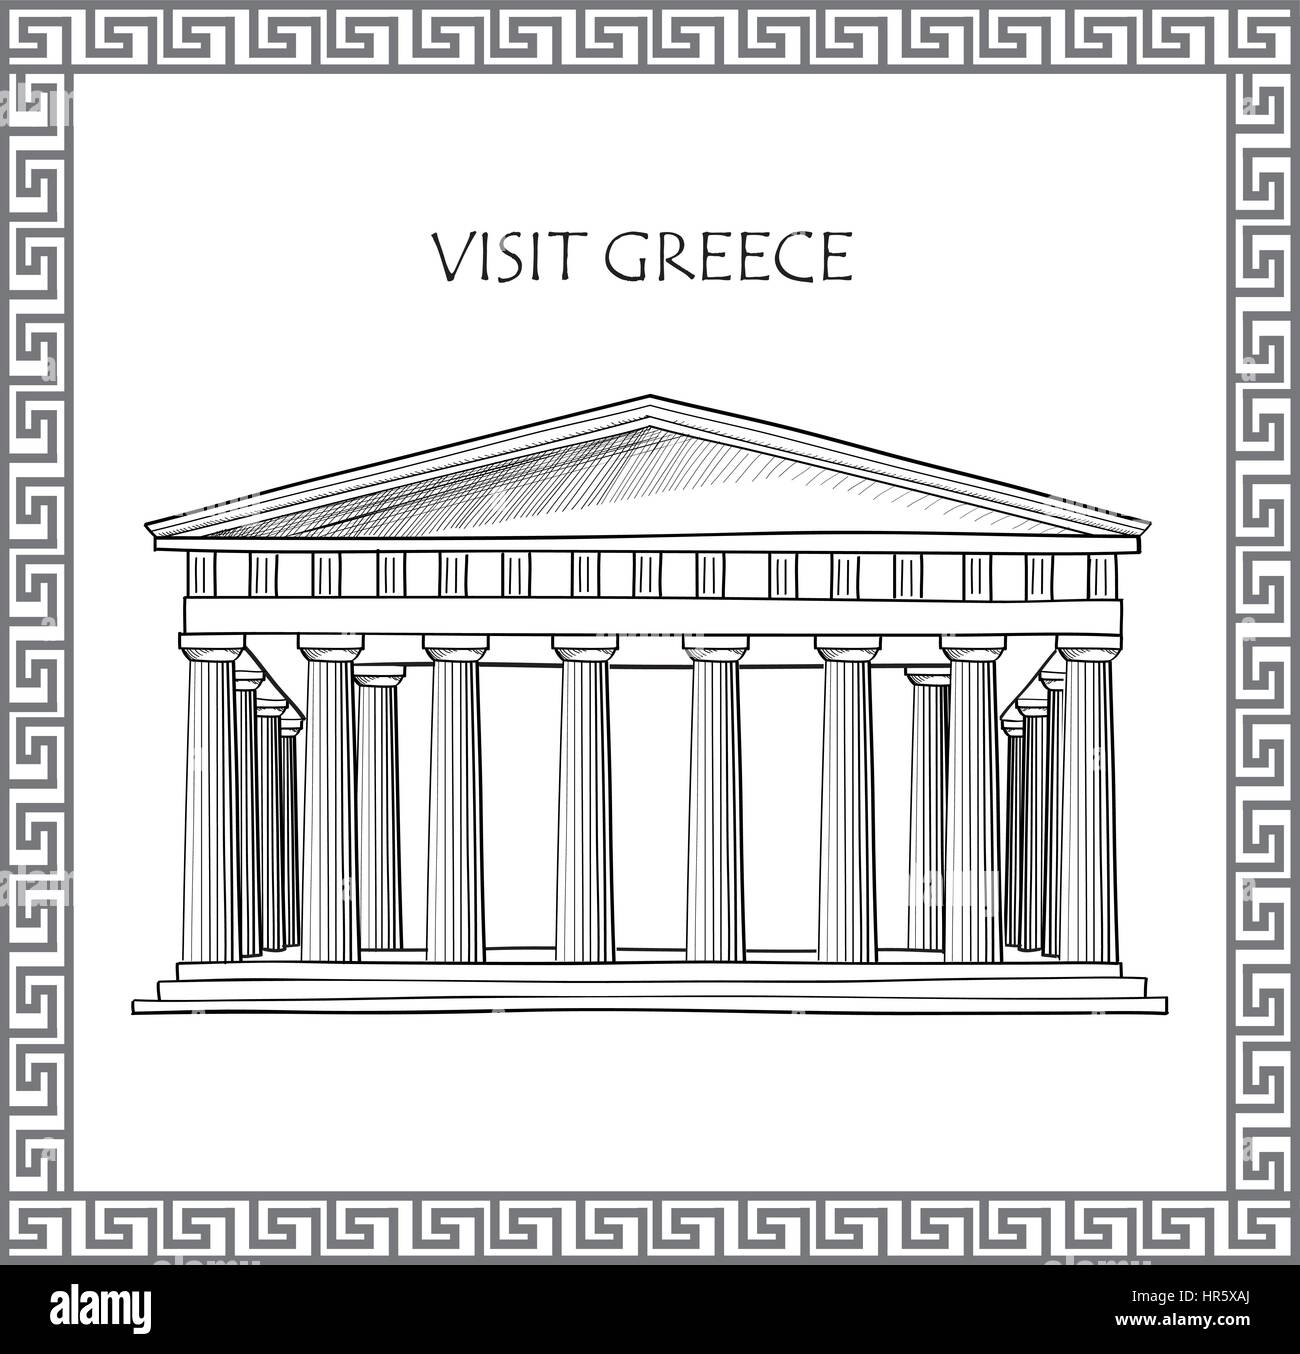 Acropolis in Athens, Greece. Visit Greece card. Ornamental traditional greek vector frame. - Stock Vector